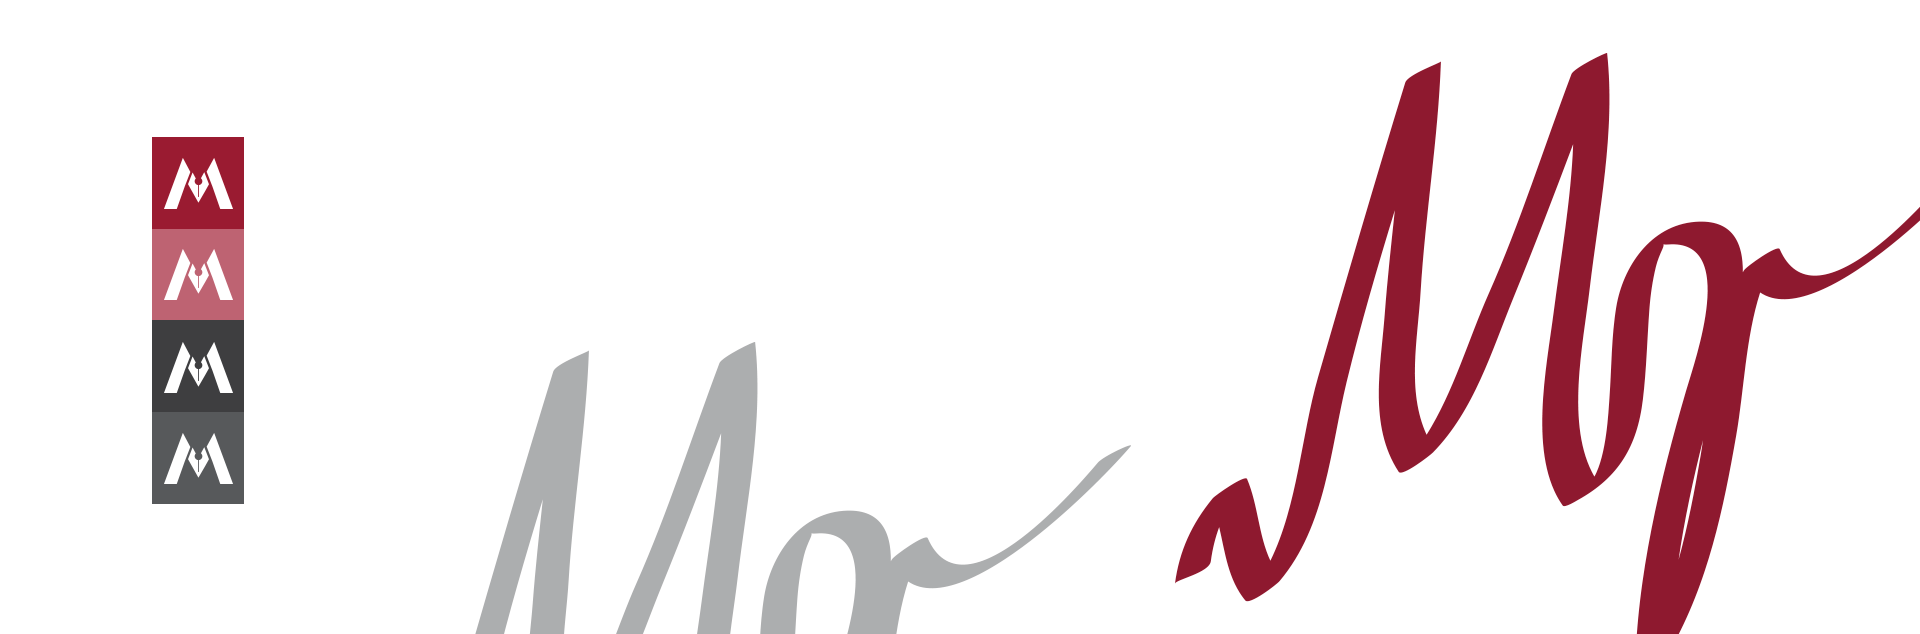 logo-design-papadaki-Brand Identity